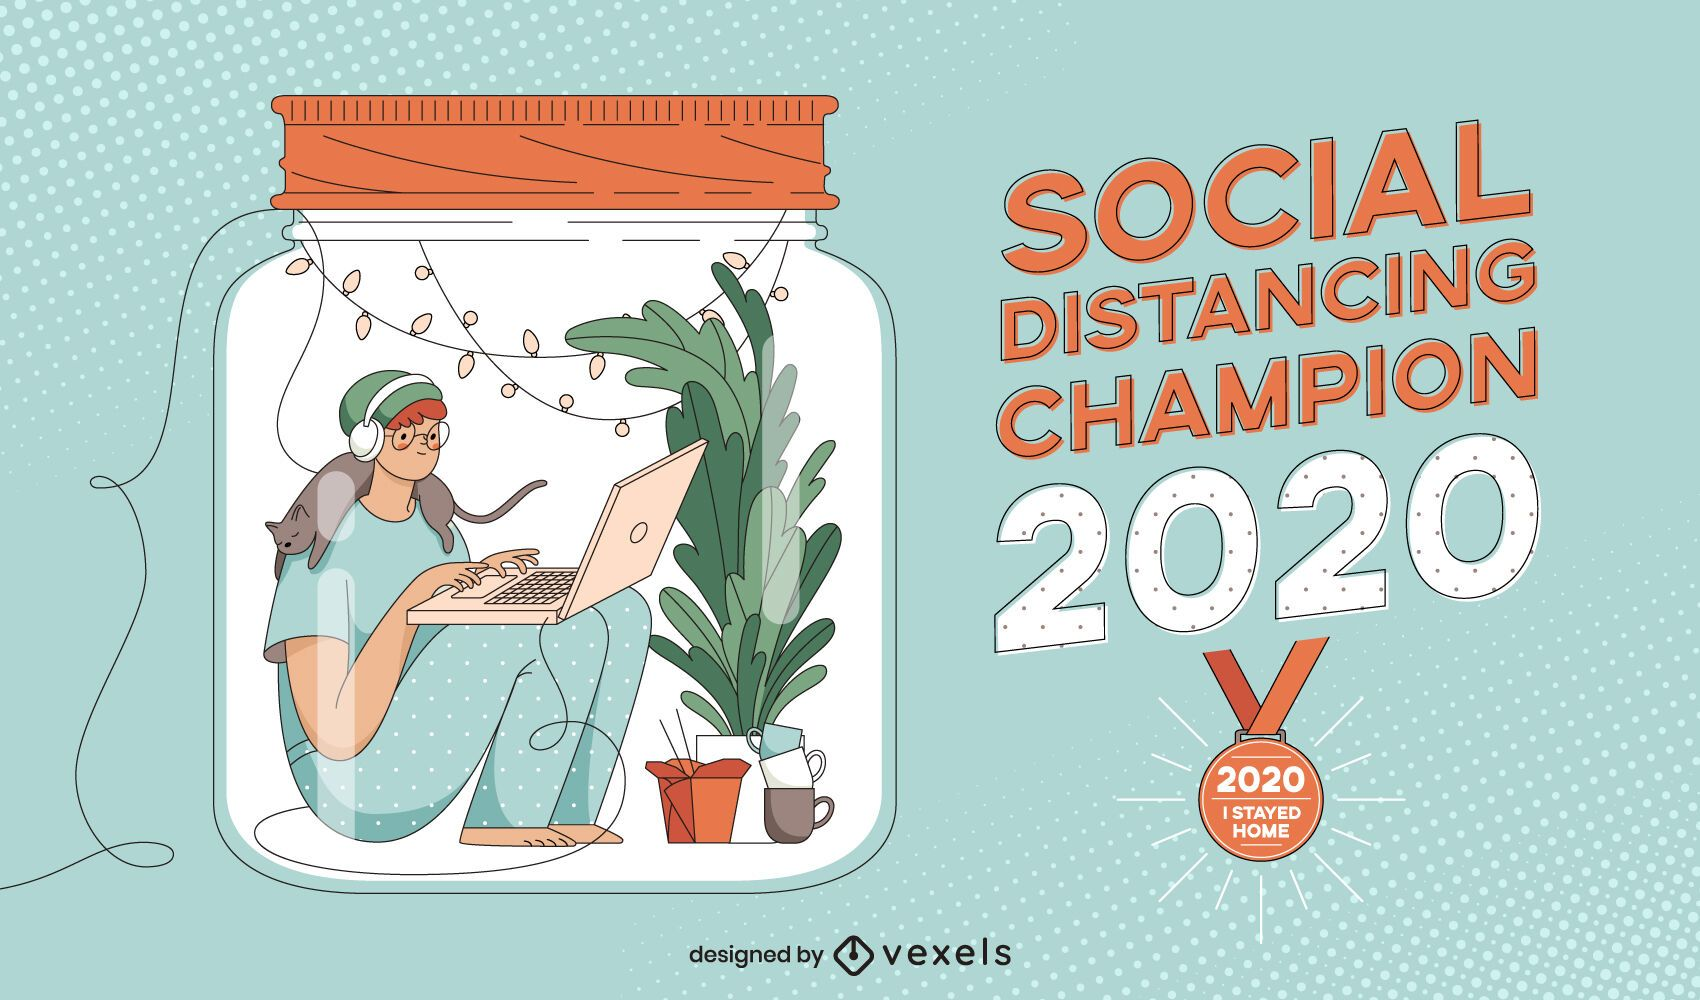 Social distancing champion illustration design